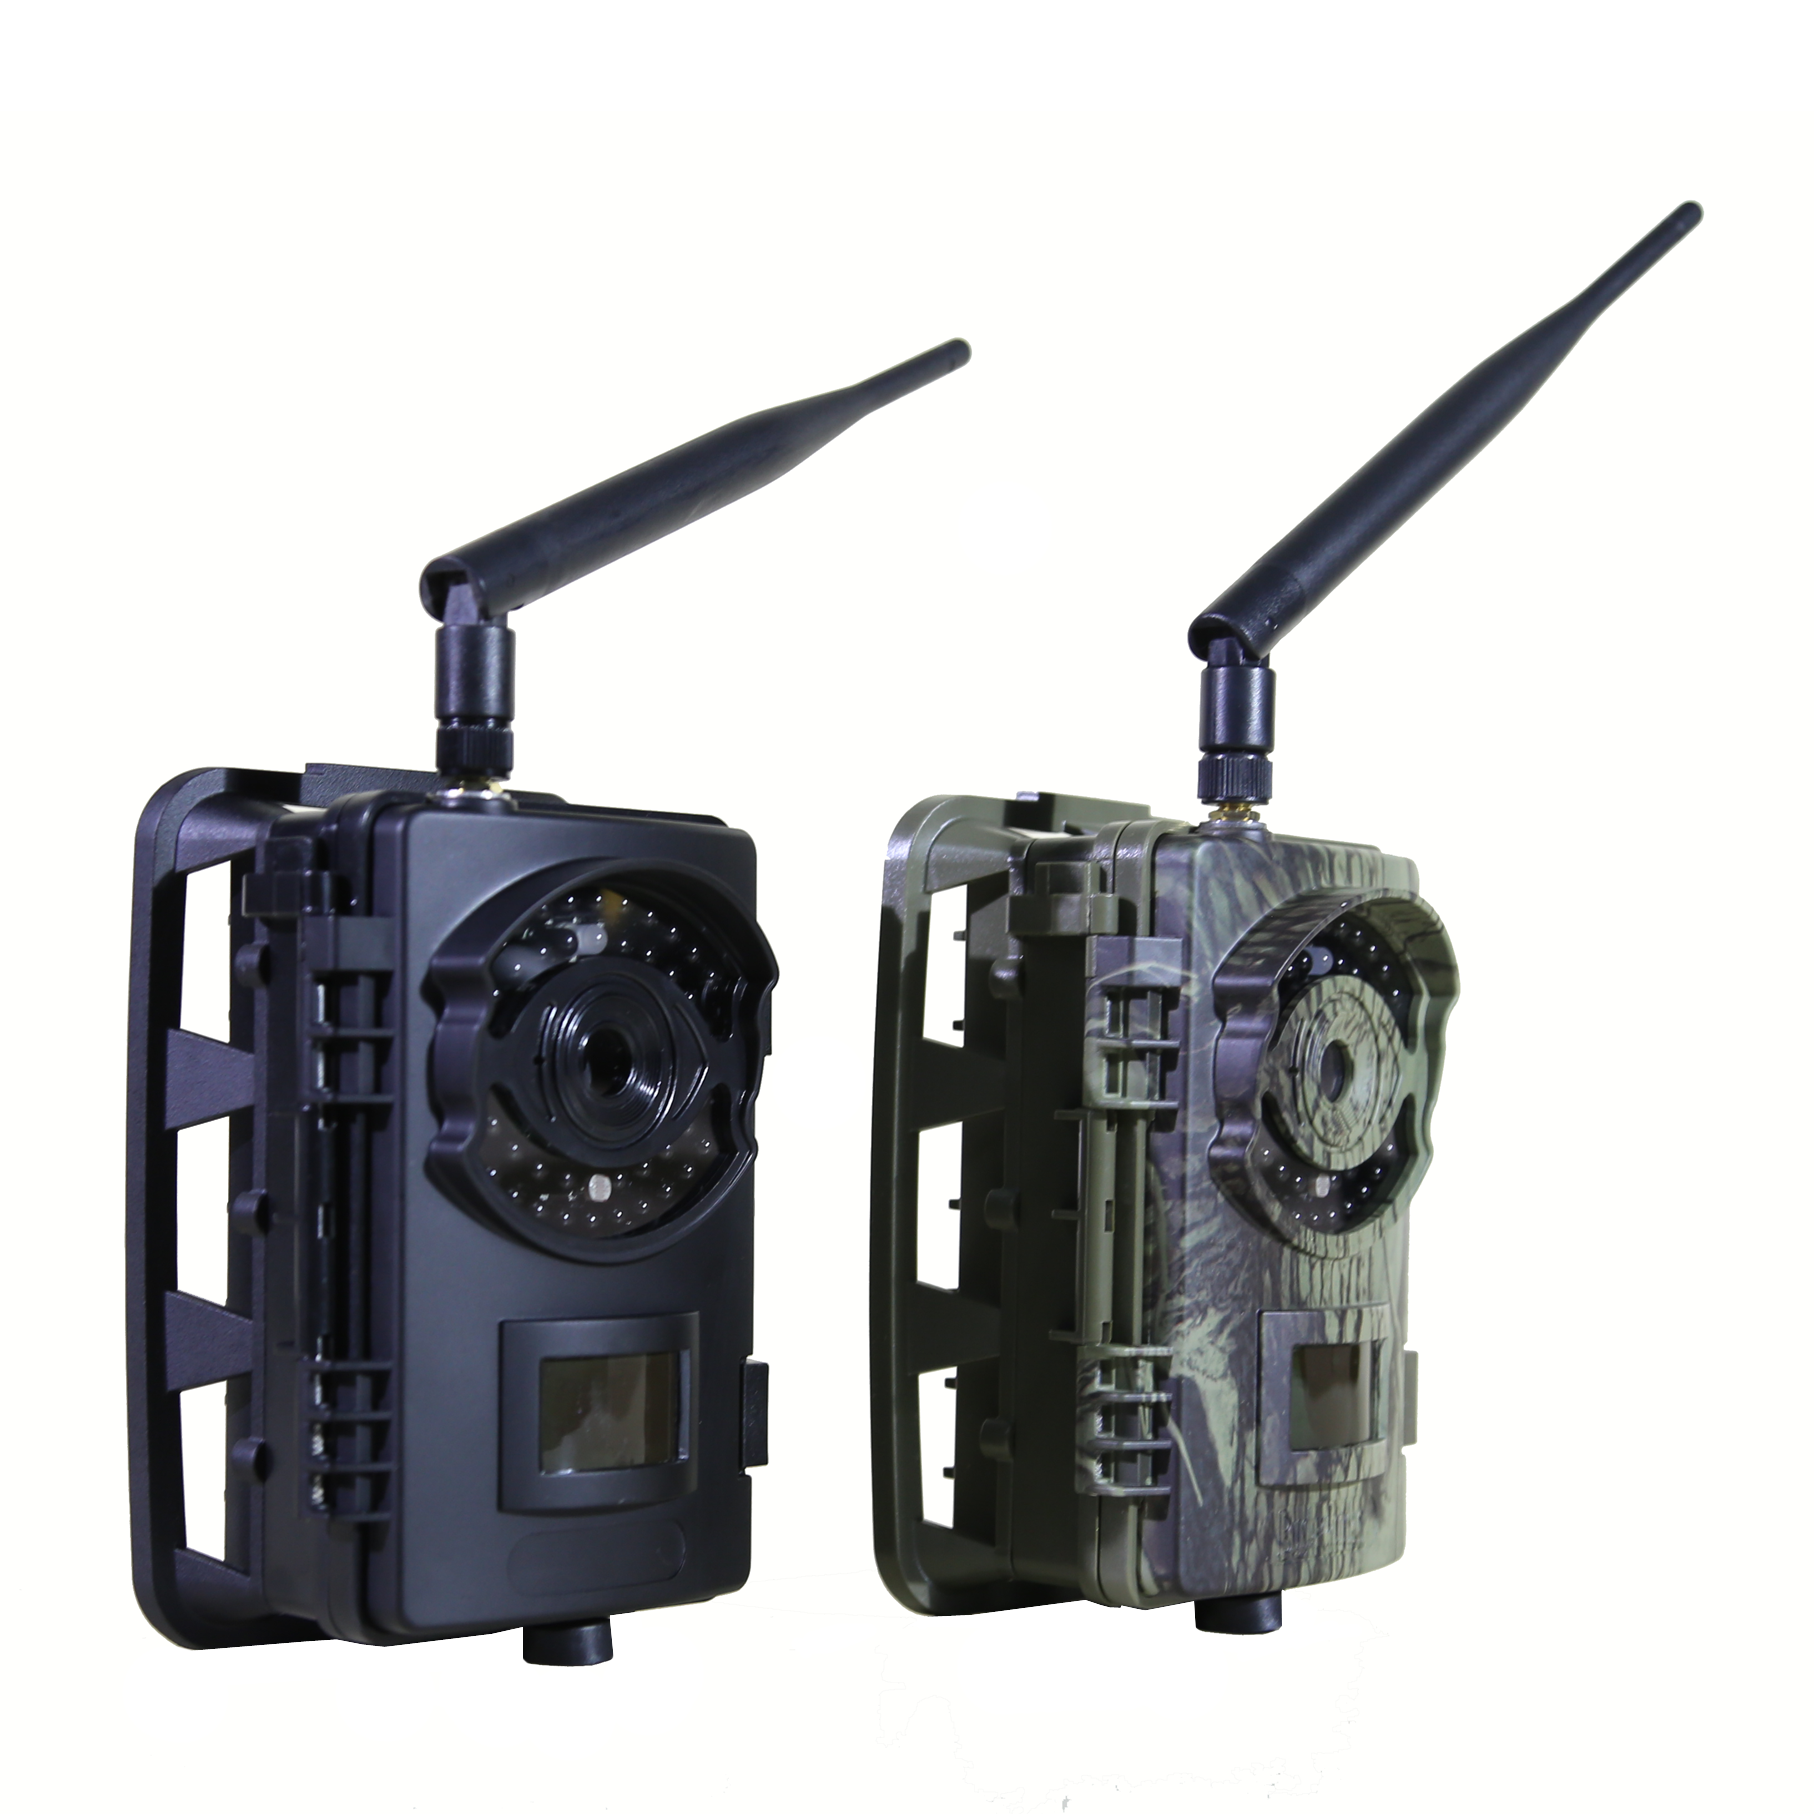 4G LTE الصيد كاميرا SMS <span class=keywords><strong>MMS</strong></span> لعبة الكاميرا مع أفضل سعر